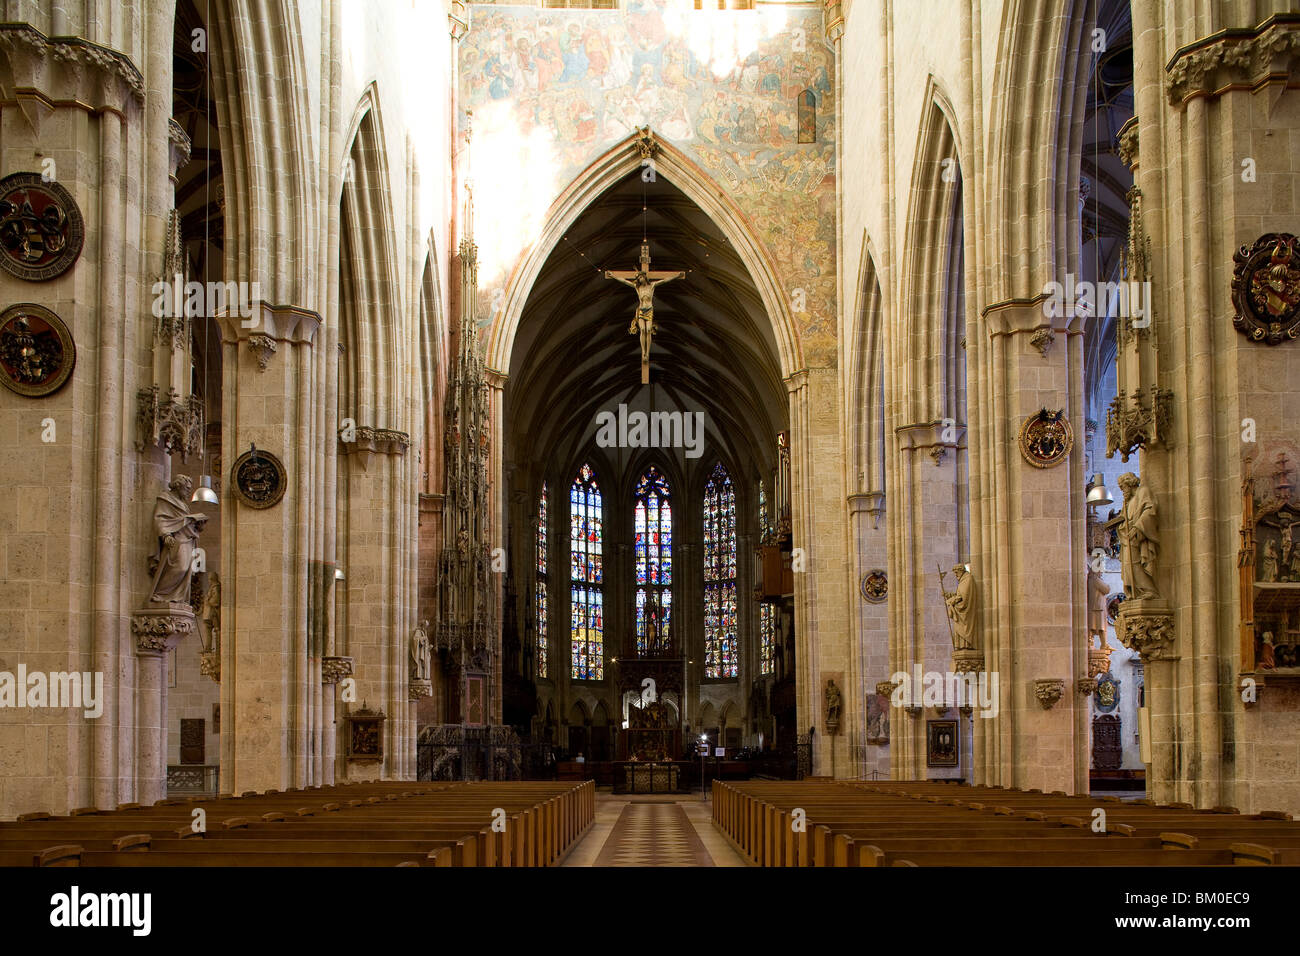 Interior view of Ulm Minster, View towards the choir stalls, Ulmer Muenster, Ulm, Baden-Wuerttemberg, Germany, Europe Stock Photo